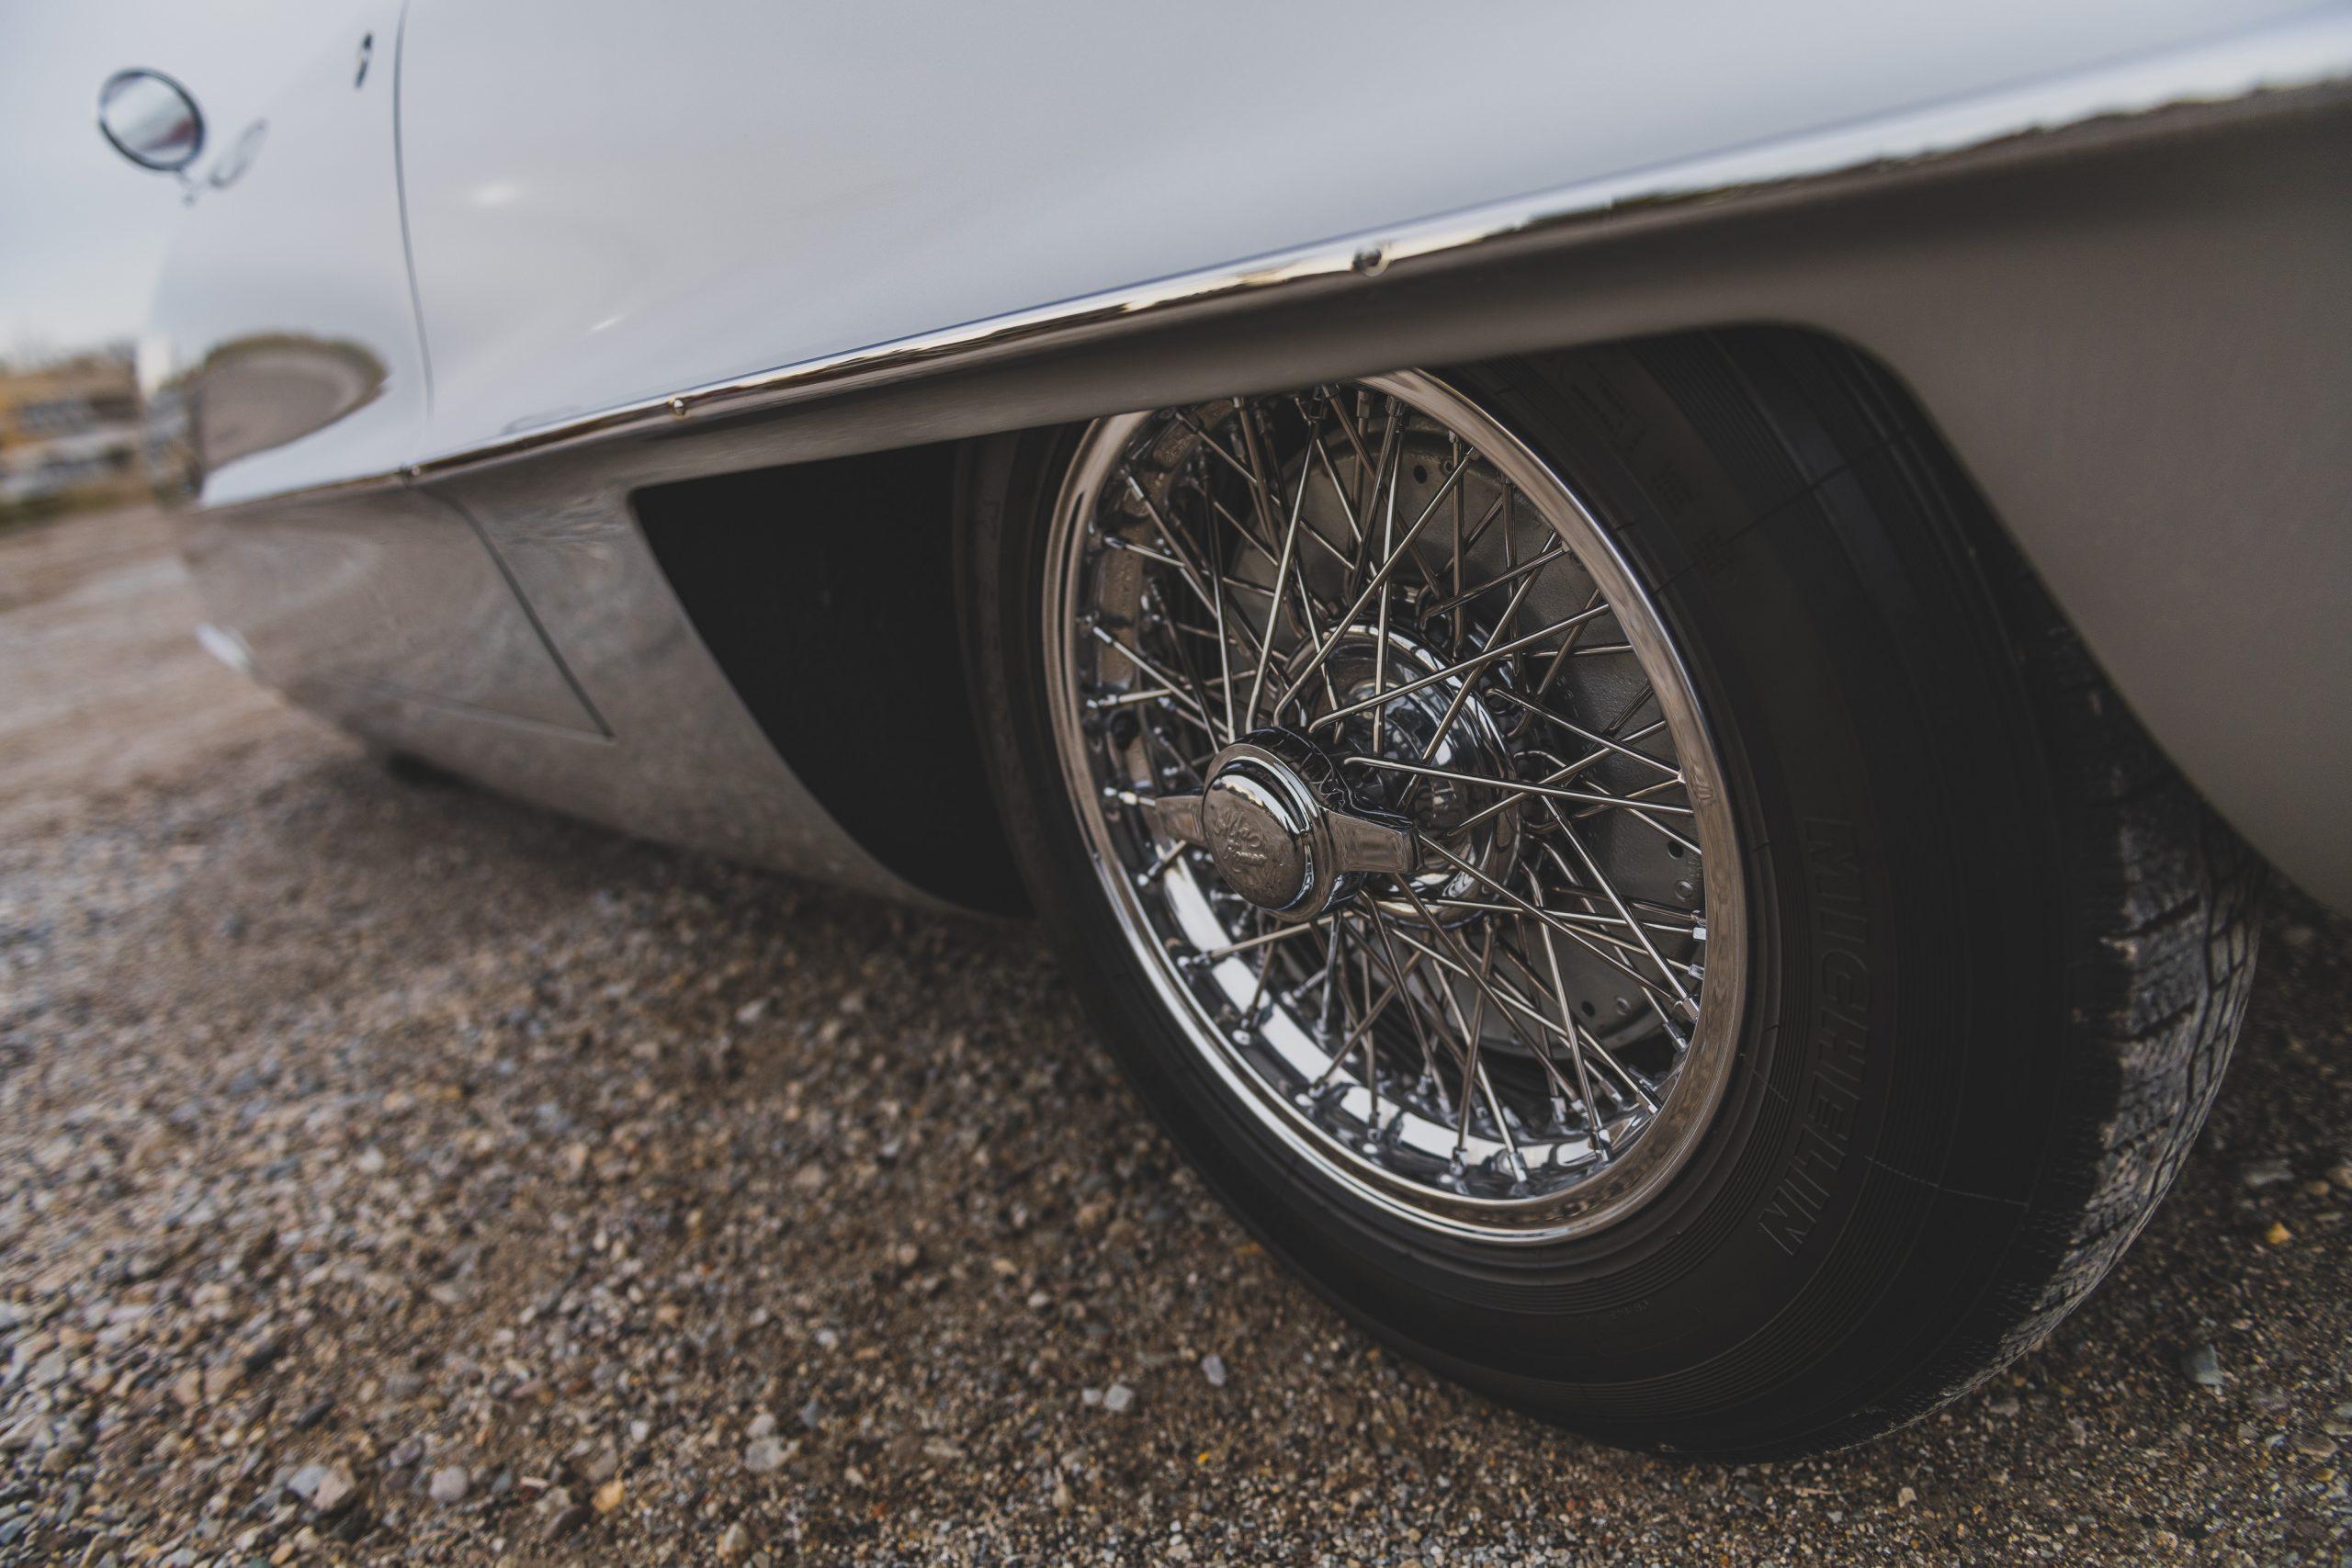 Alfa Romeo Berlina Aerodinamica Tecnica wire wheels